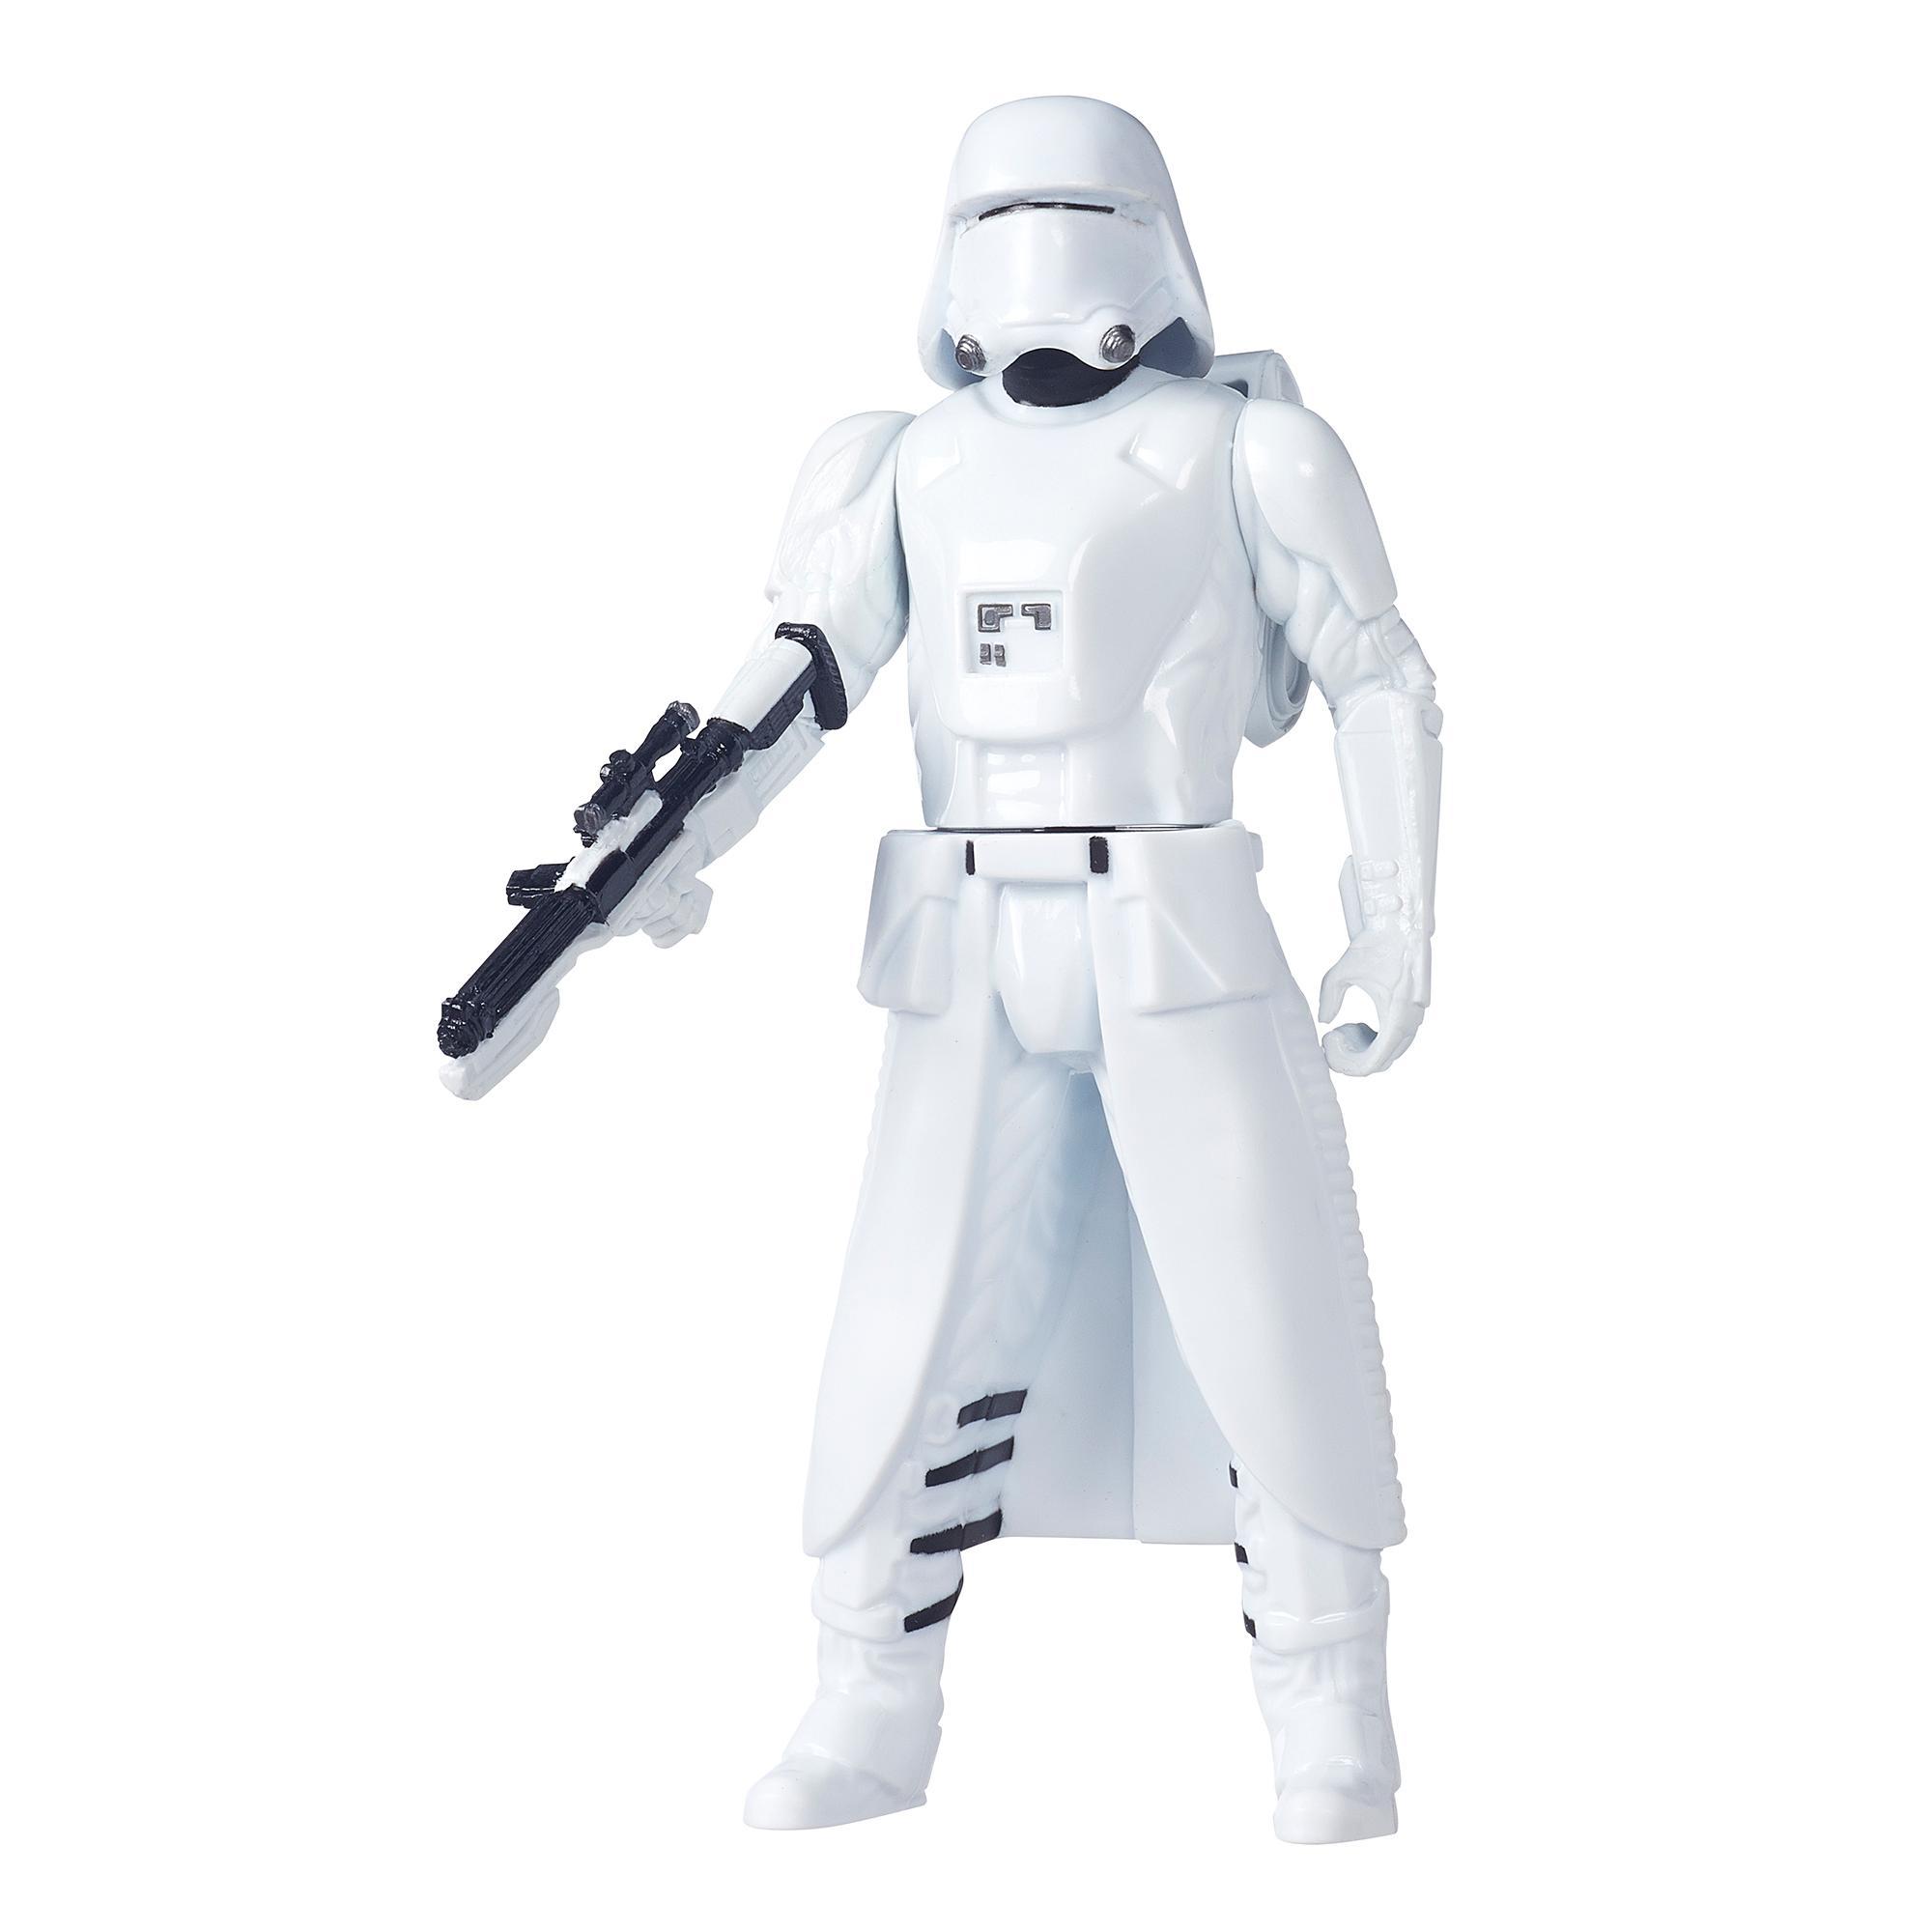 Star Wars El despertar de la fuerza: Snowtrooper de la Primera Orden de valor de 15 cm